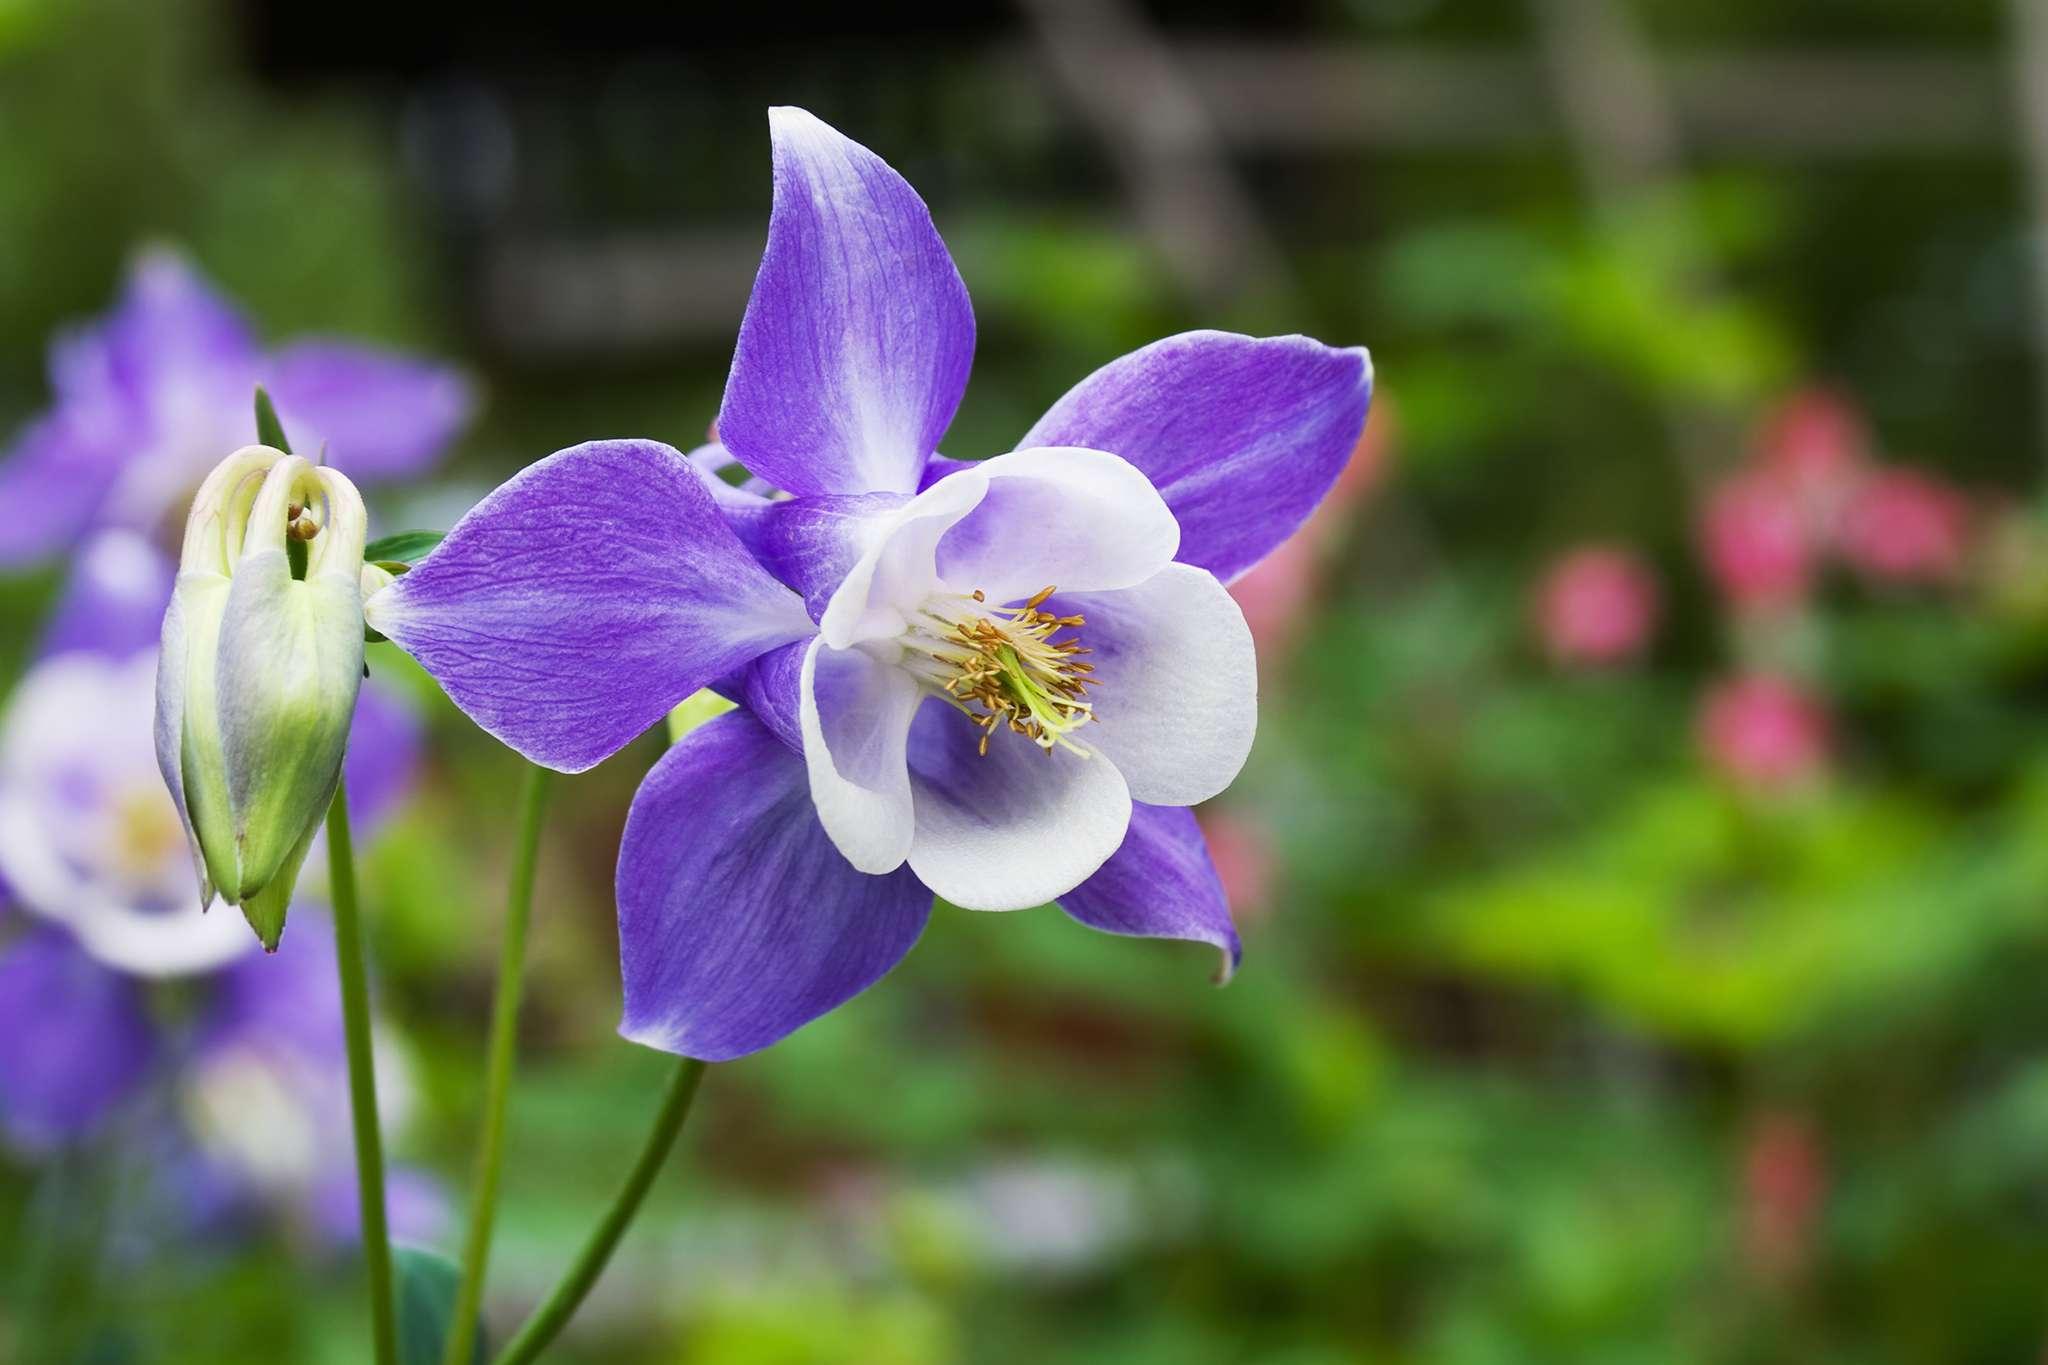 purple and white columbine